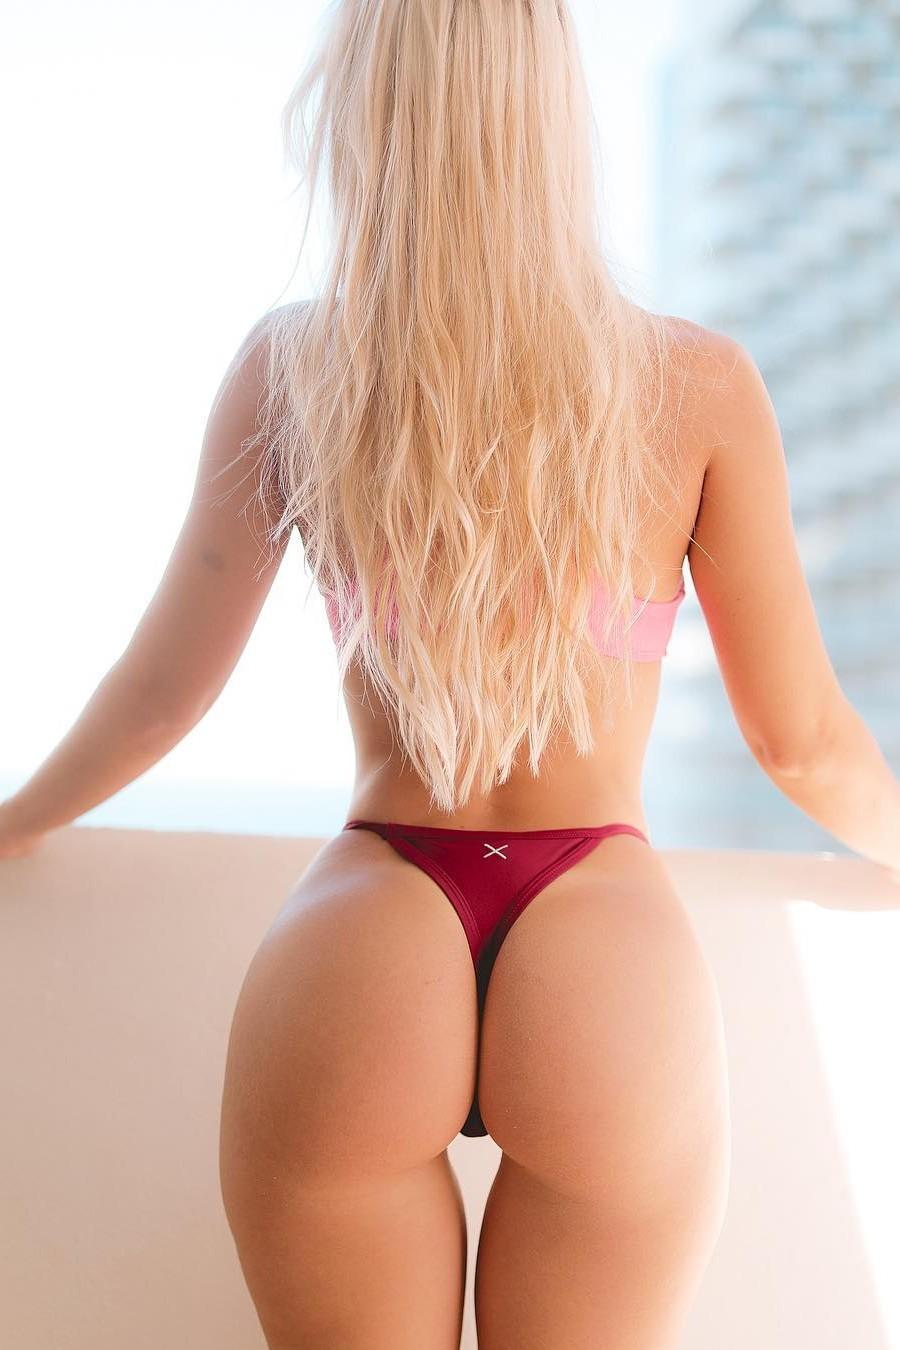 Blonde Asses – Telegraph